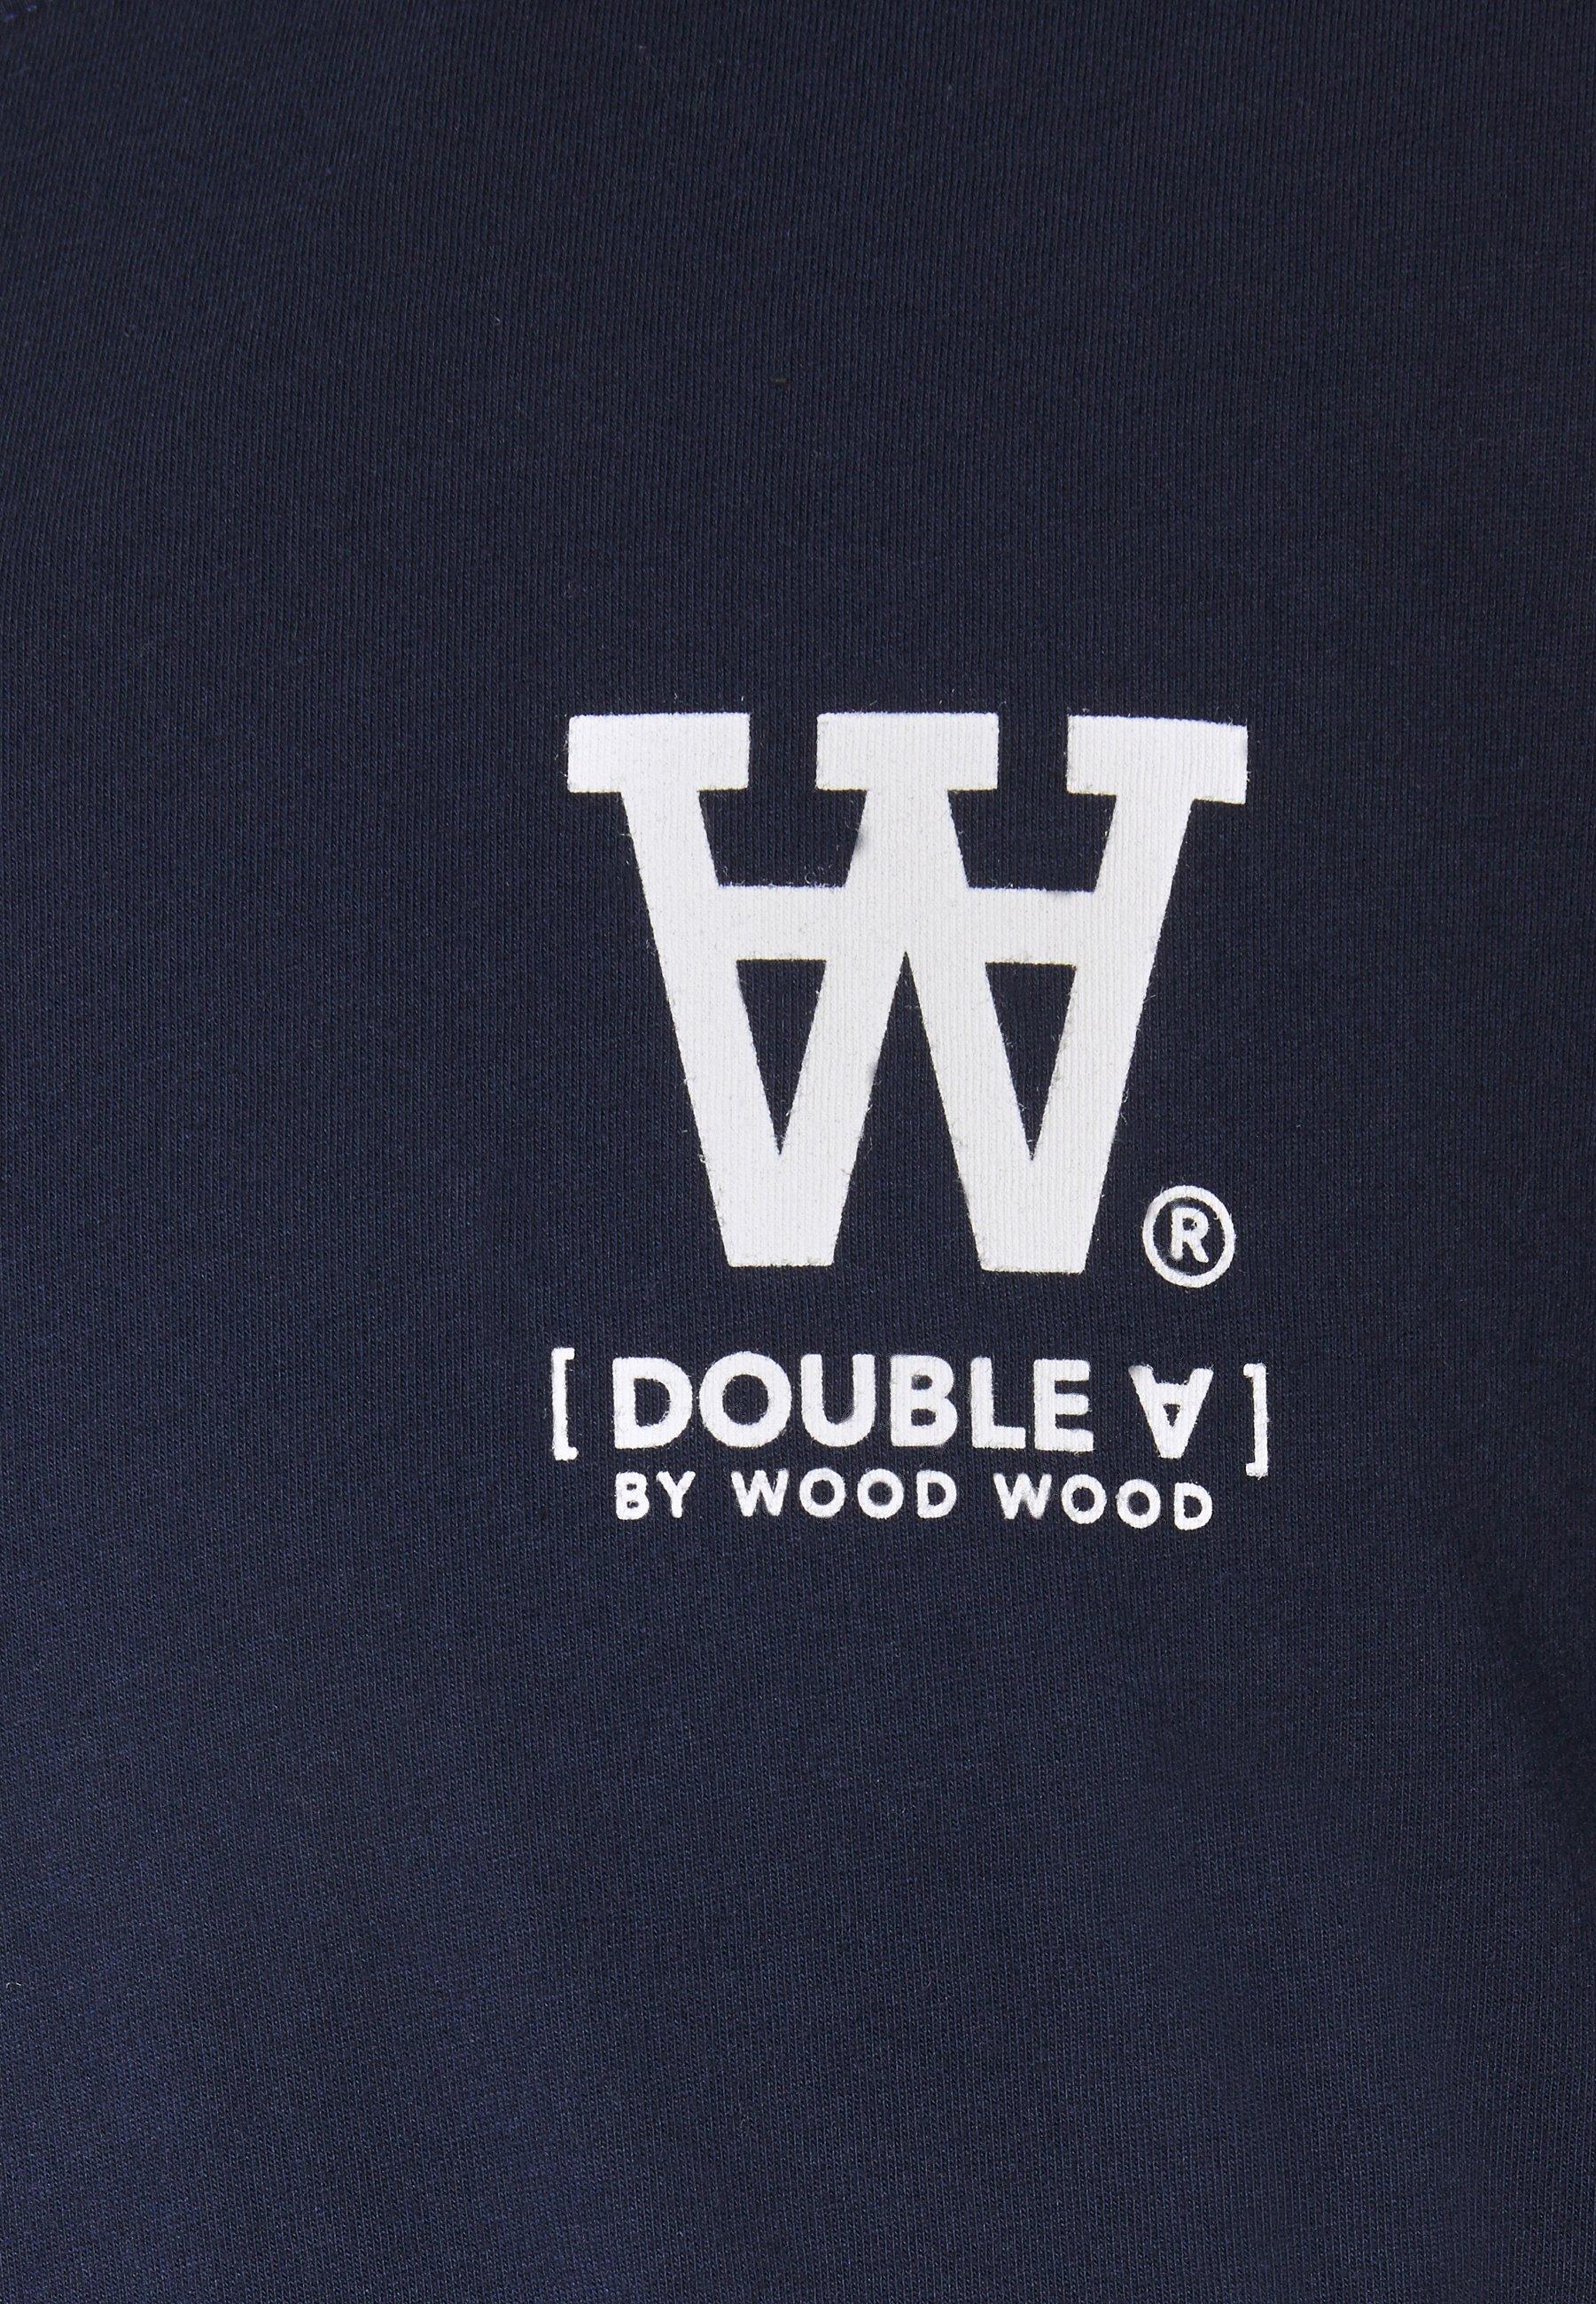 Wood Ace - T-shirts Print Navy